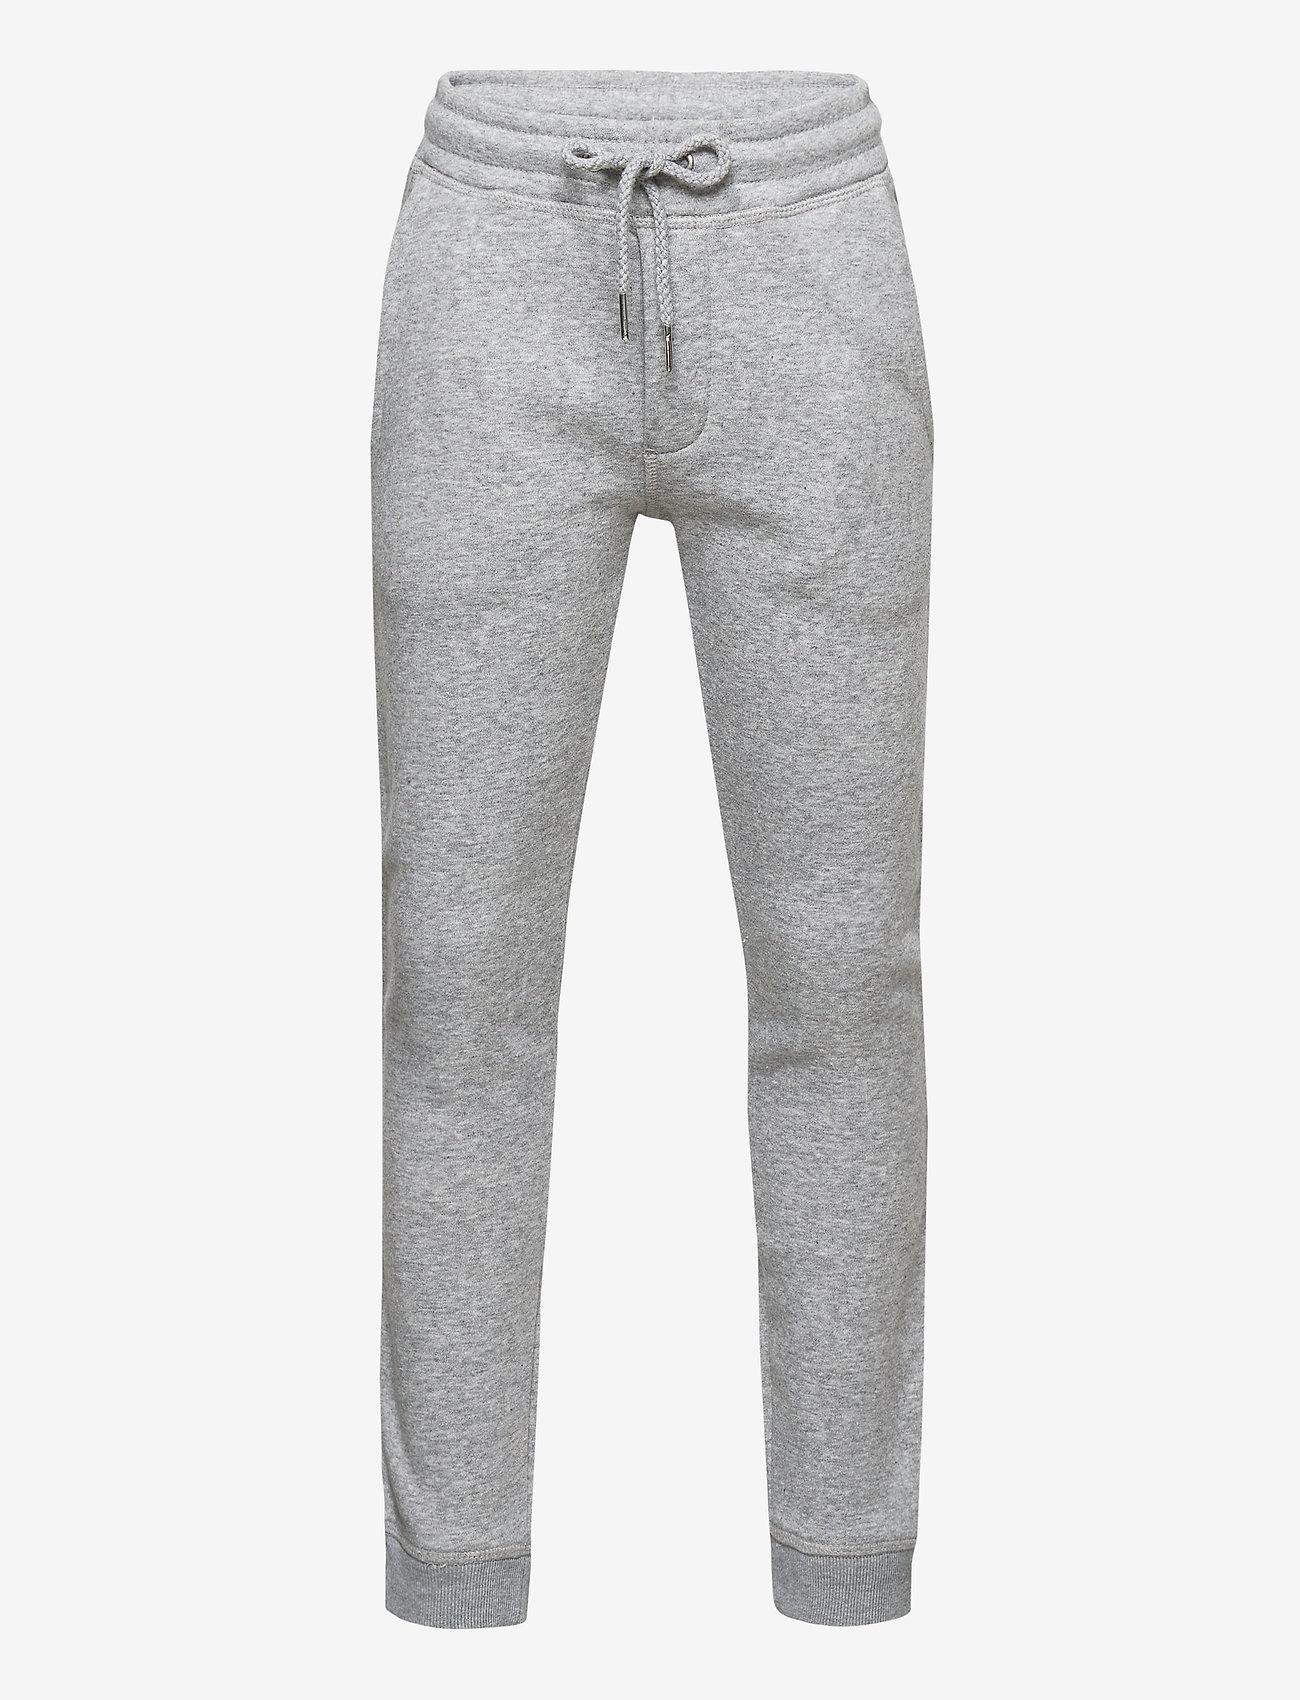 Jack & Jones - JJIGORDON JJSOFT SWEAT PANTS VG NOOS JR - verryttelyhousut - light grey melange - 0